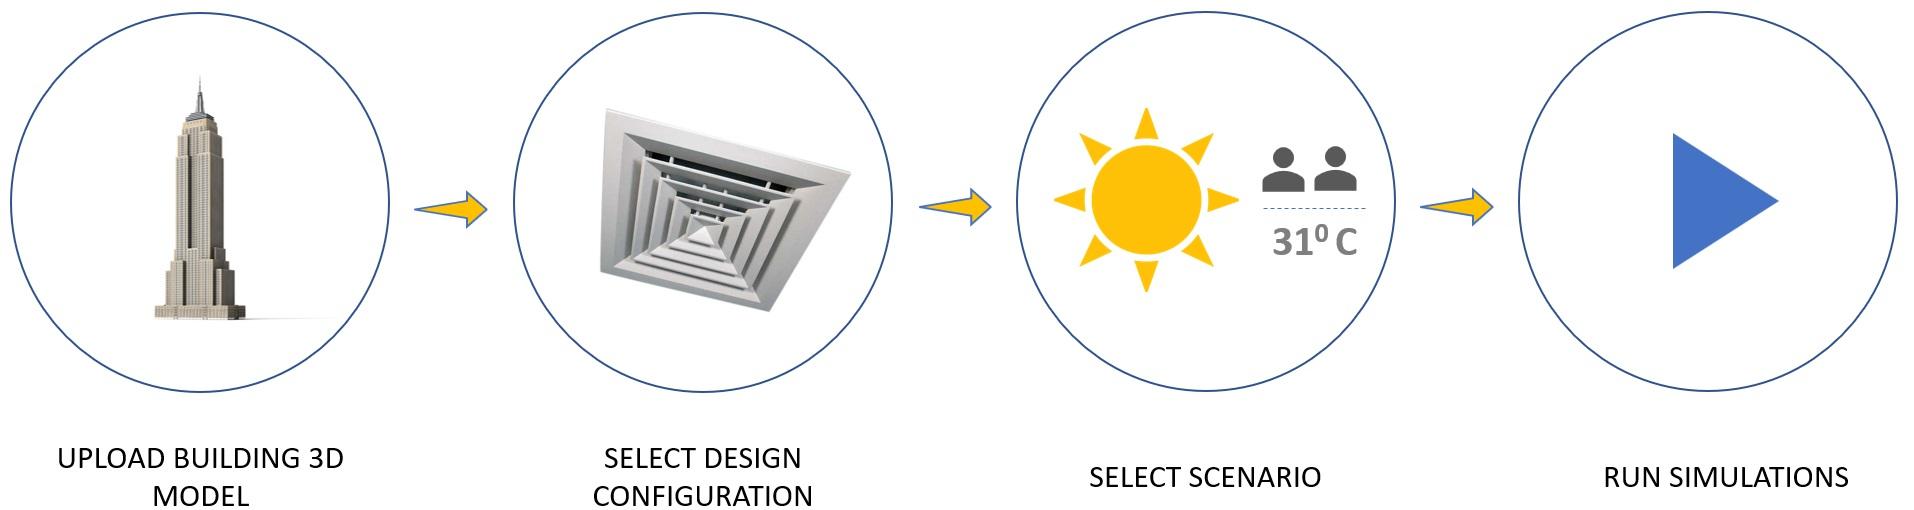 A radar chart illustrating the multi-objective design process involved in HVAC system designs